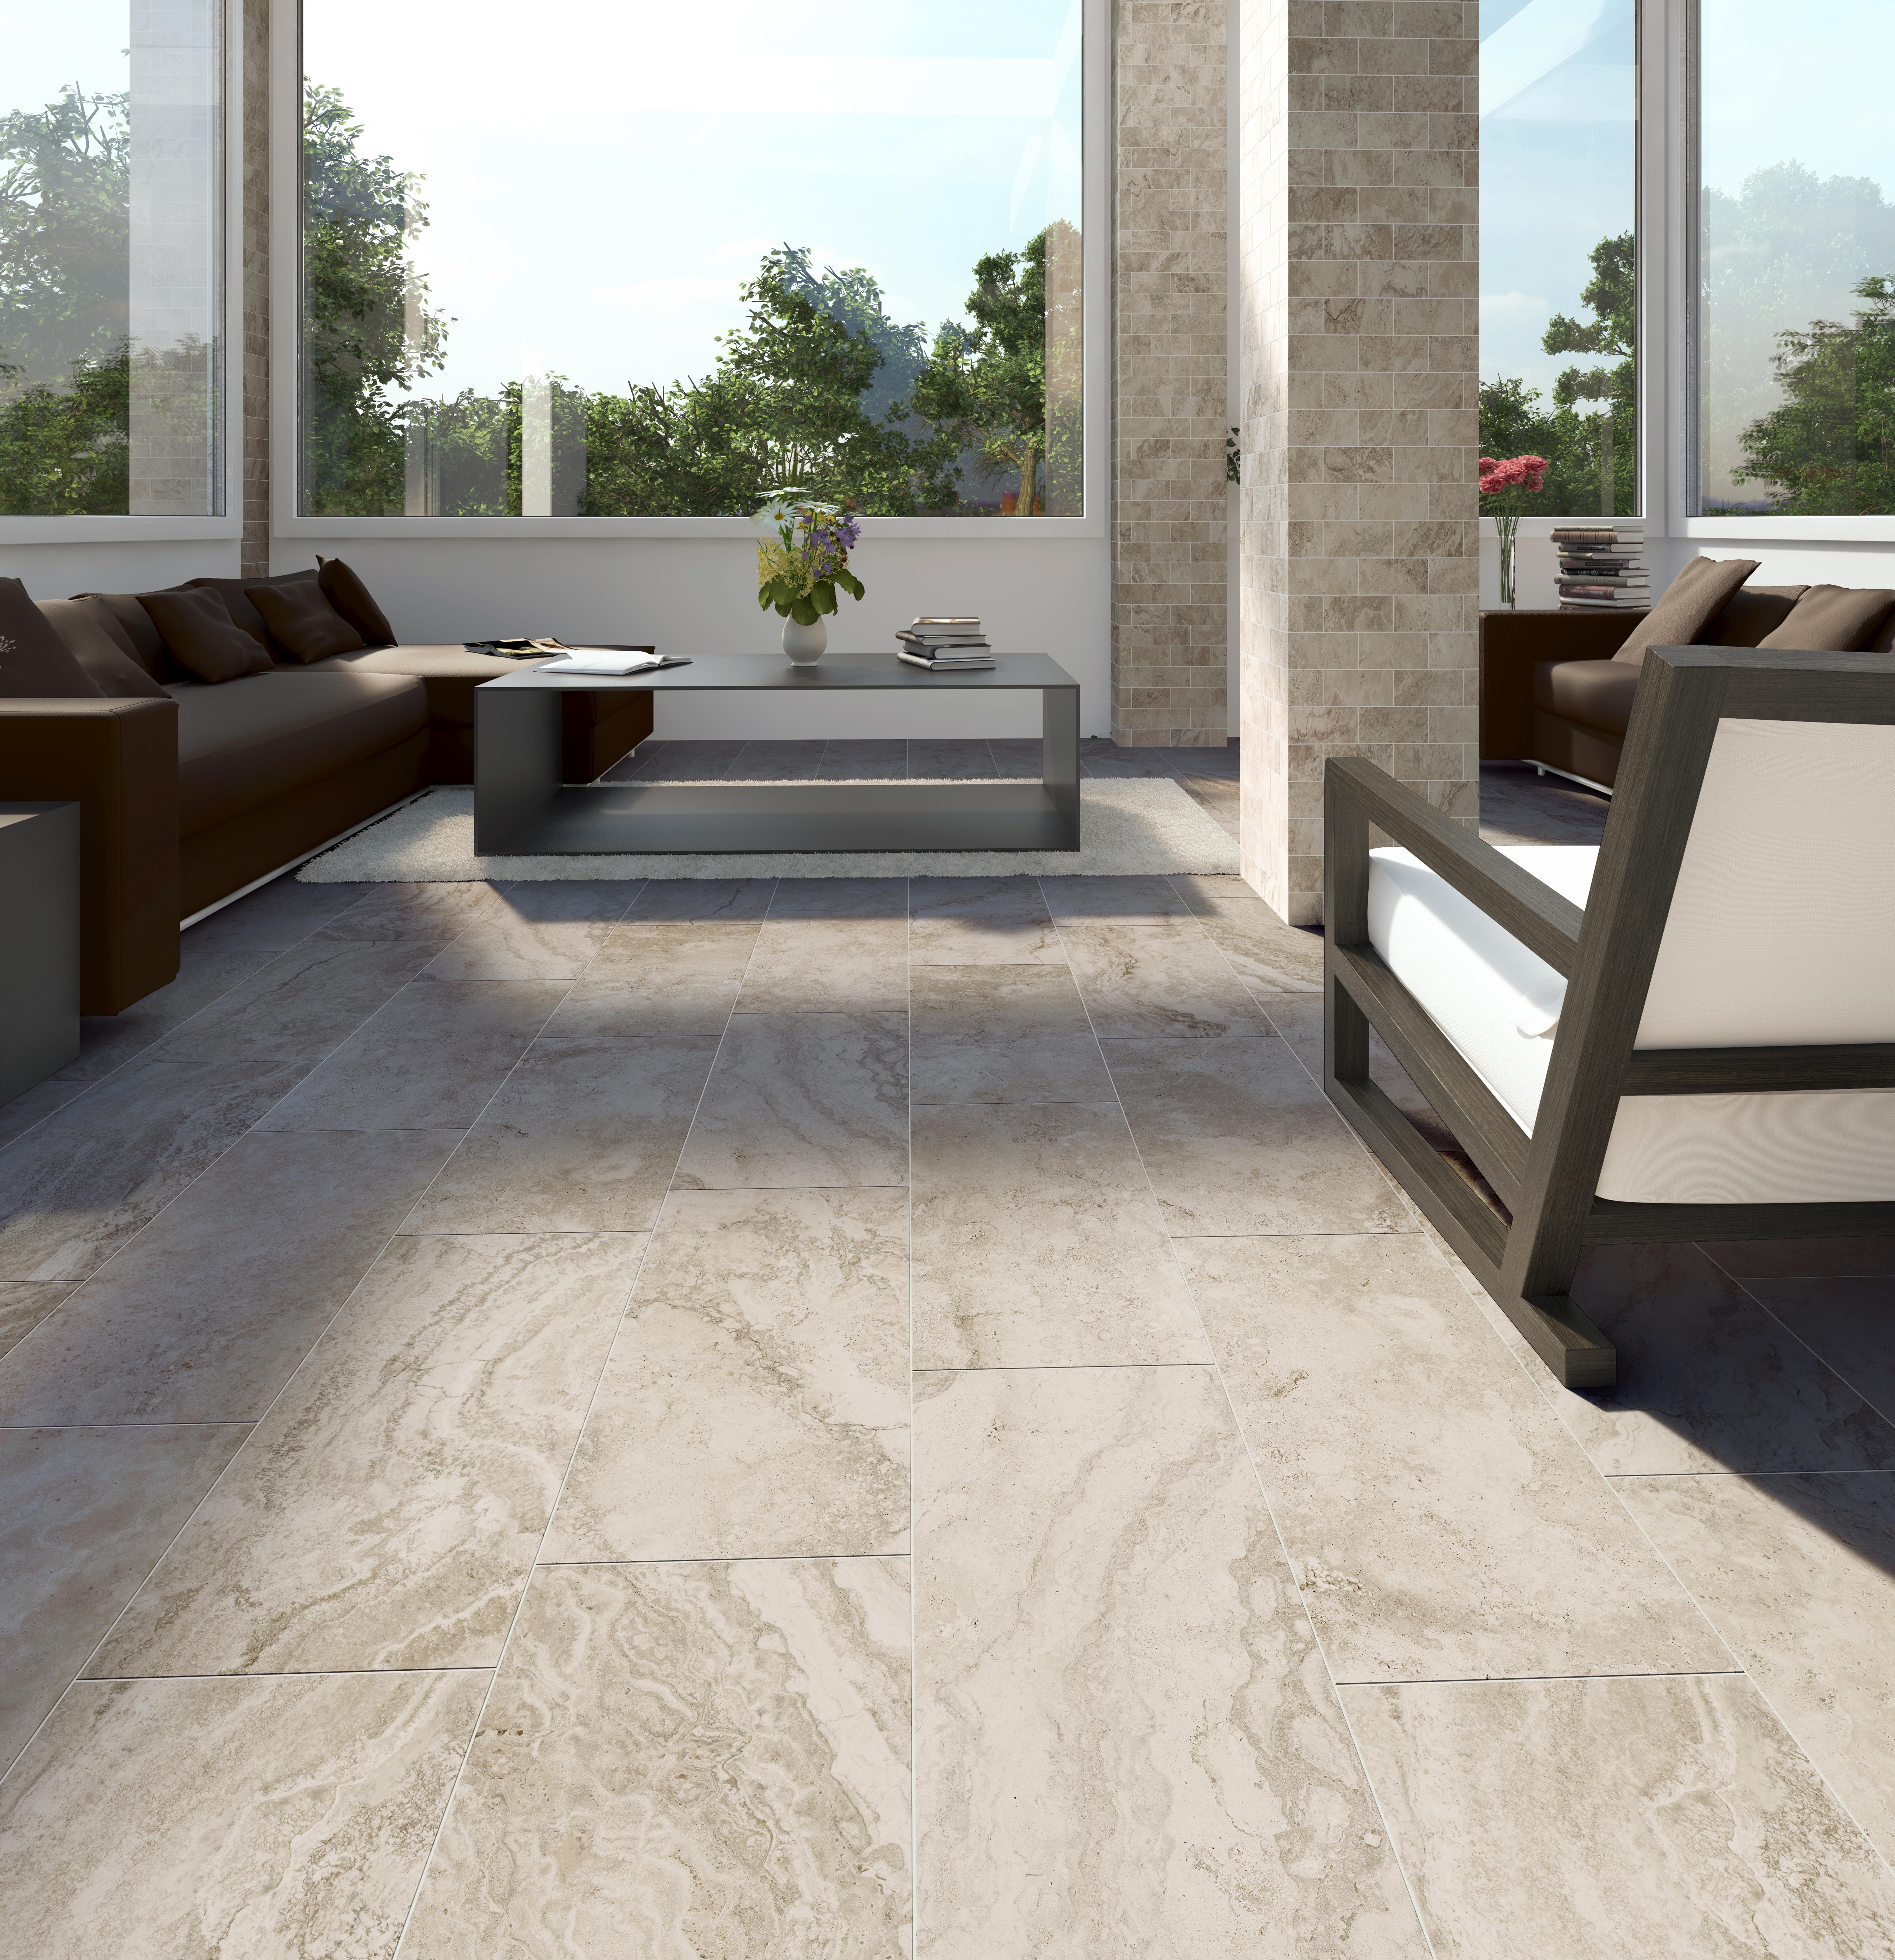 floor nadine porcelain x tile at grey floors shiny tiles futura styles ctm category glazed